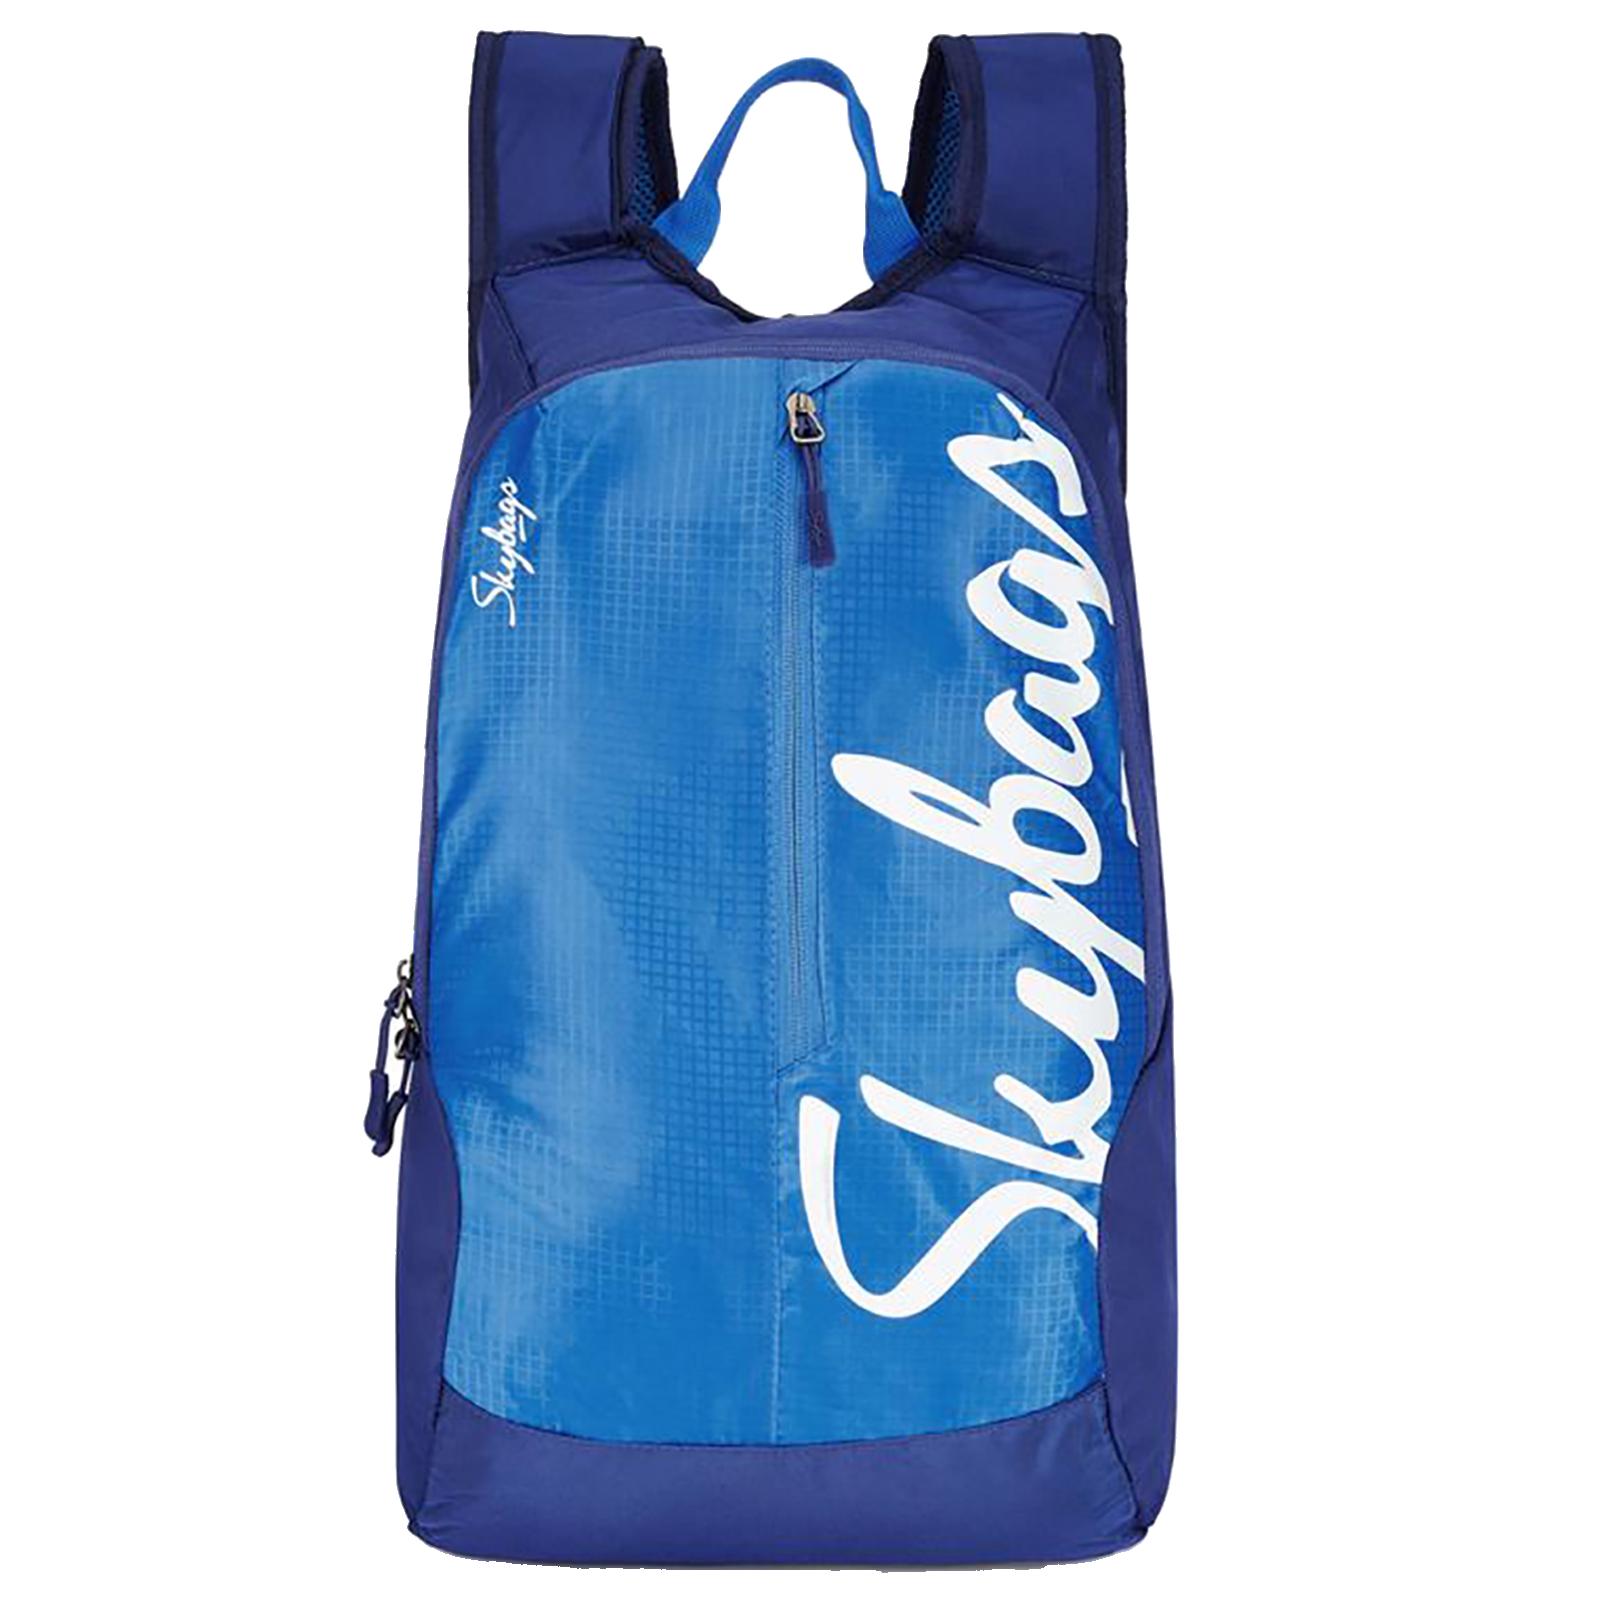 Sky Bags Boho 04 18 Litres Gucci Fabric Backpack (Quick Access Pocket, BPBOH4BLU, Blue)_1